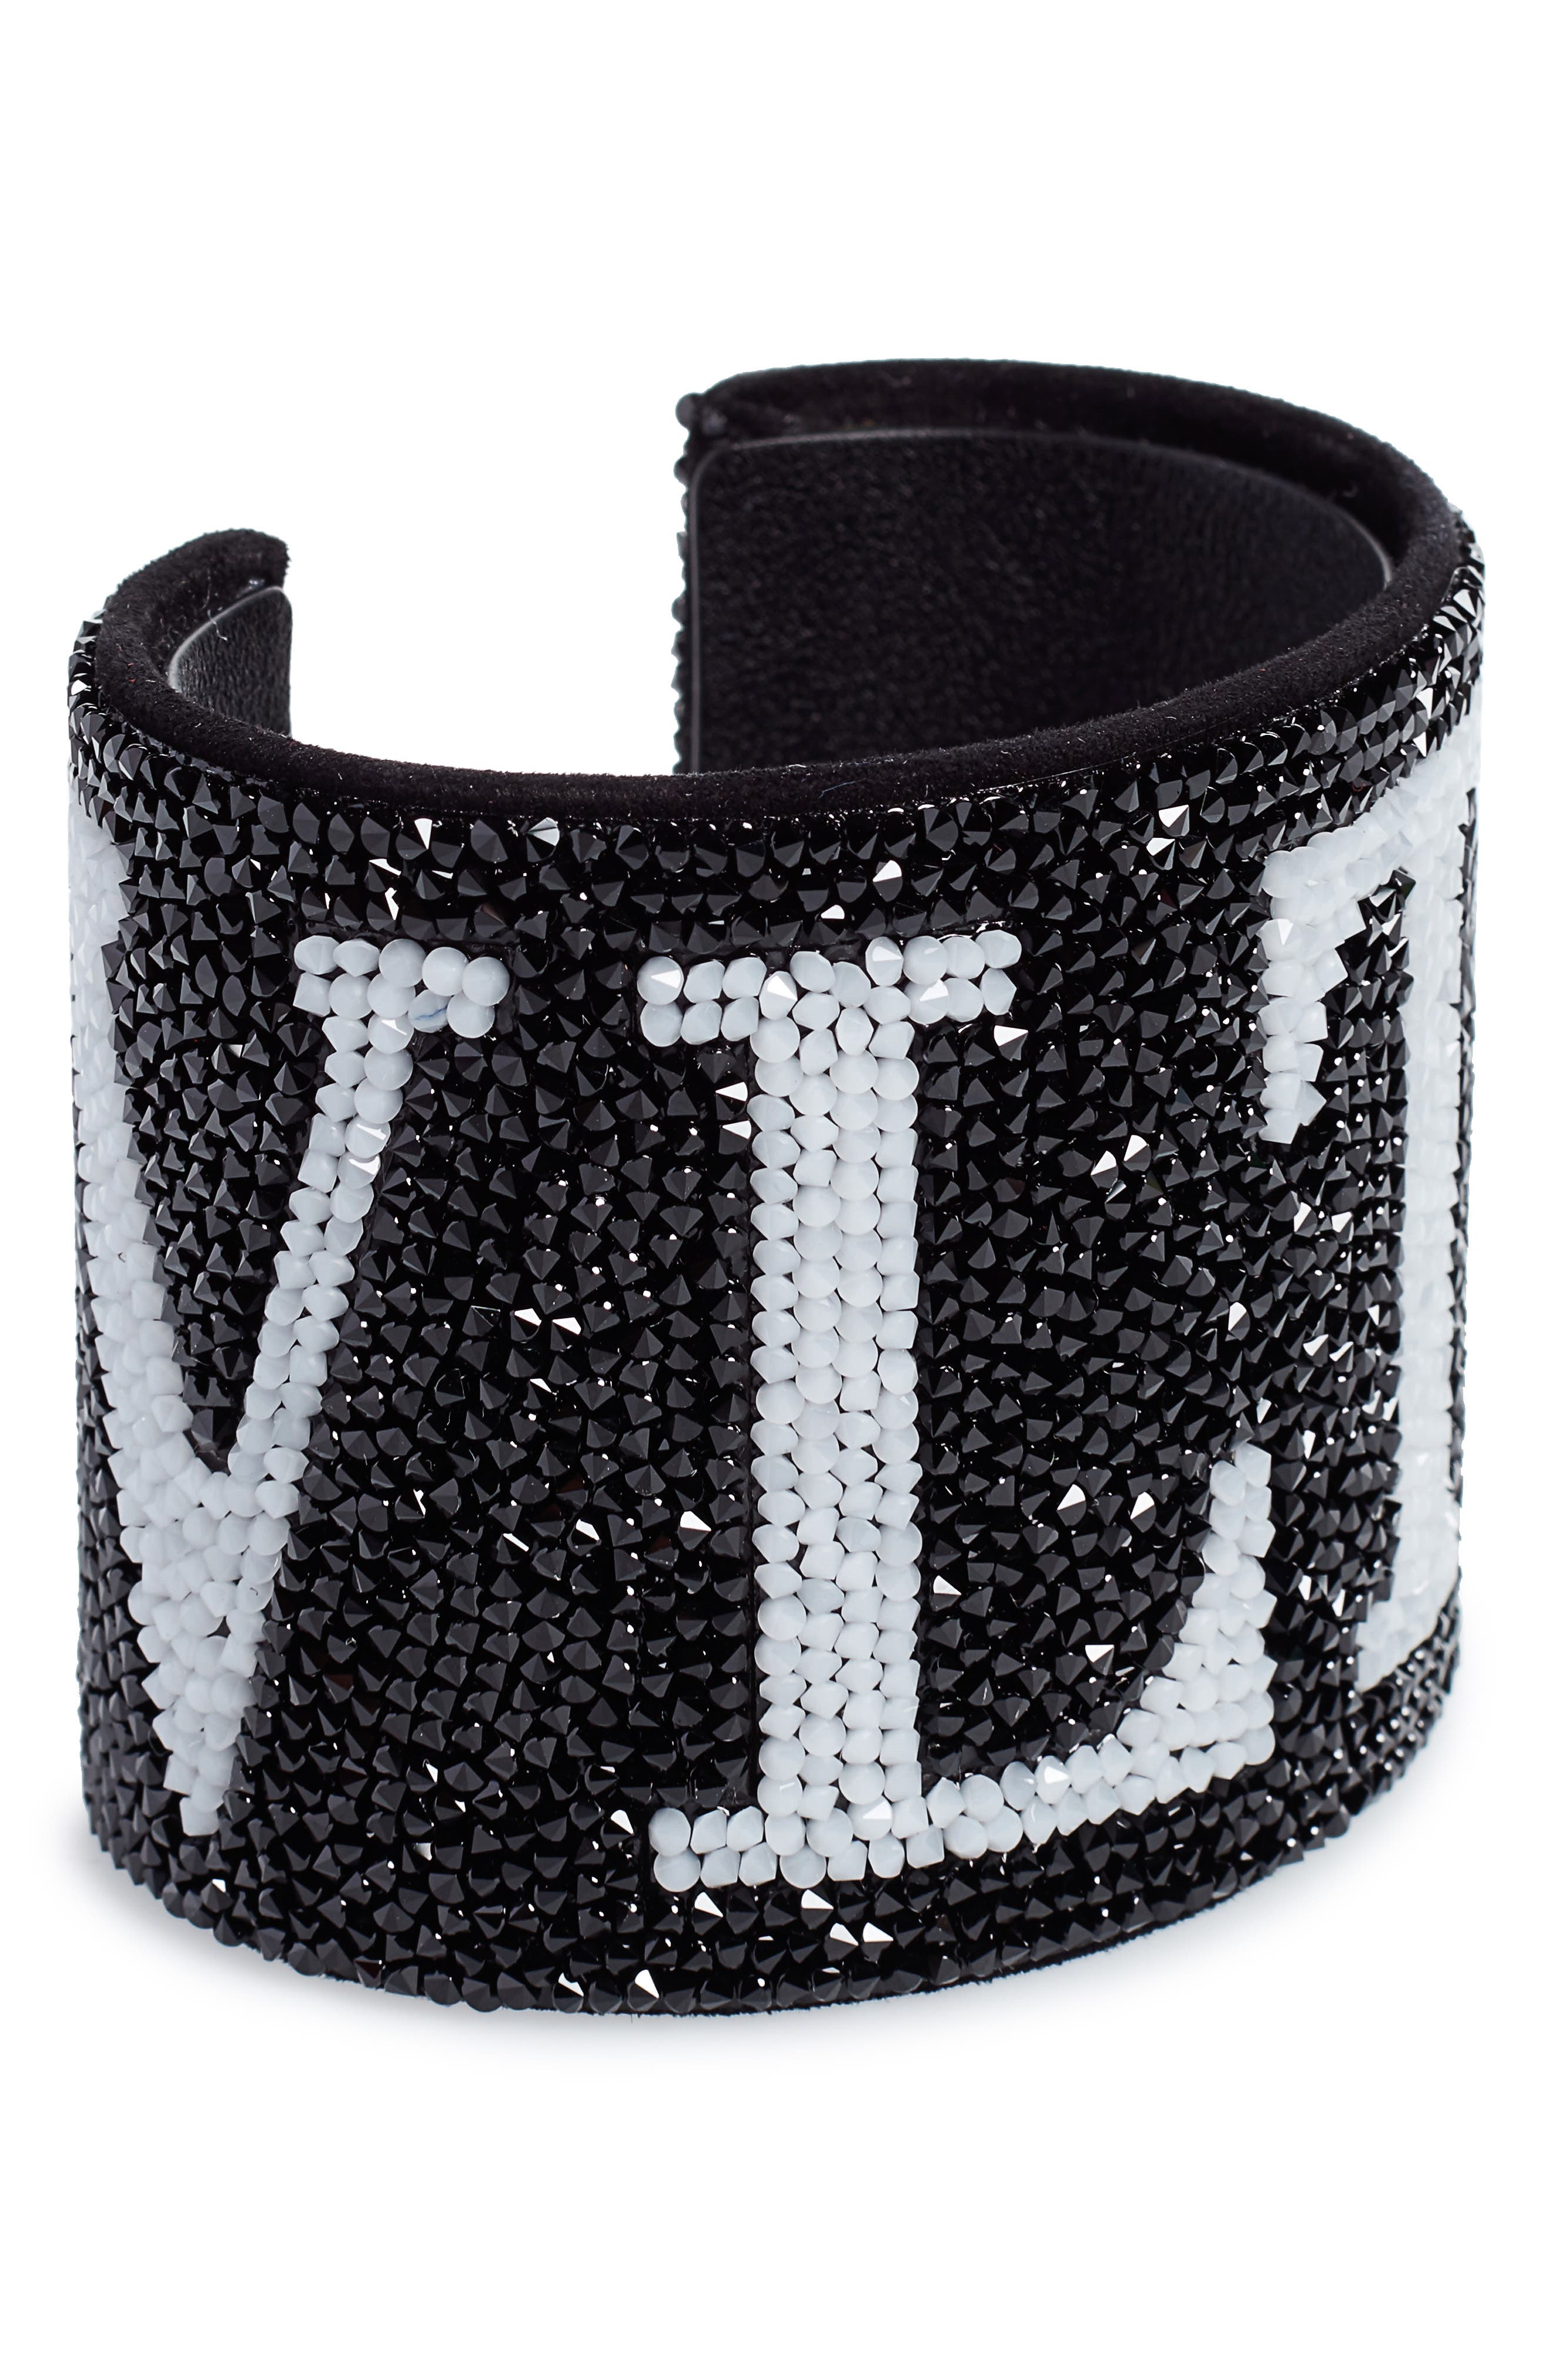 VALENTINO VLTN Cuff Bracelet, Main, color, 001